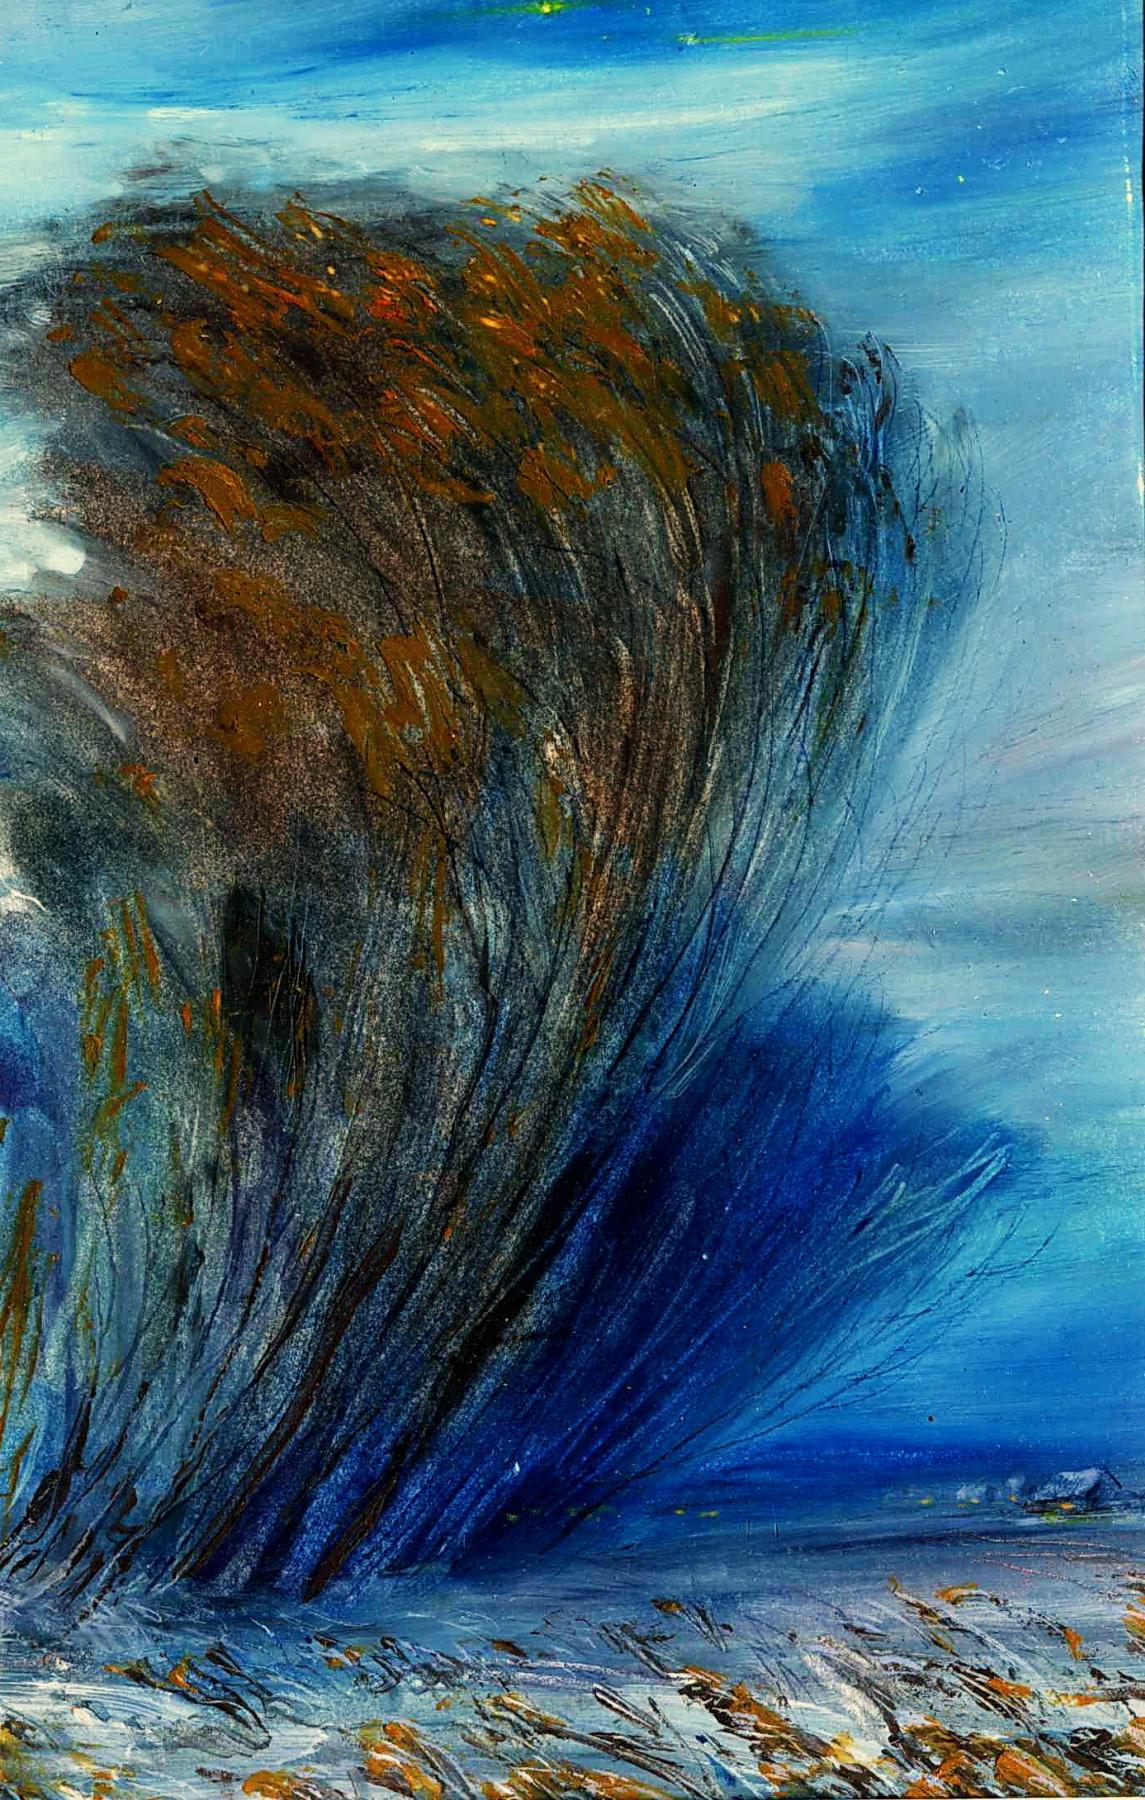 Константин Леонидович Антипов. Prophecy of the wind